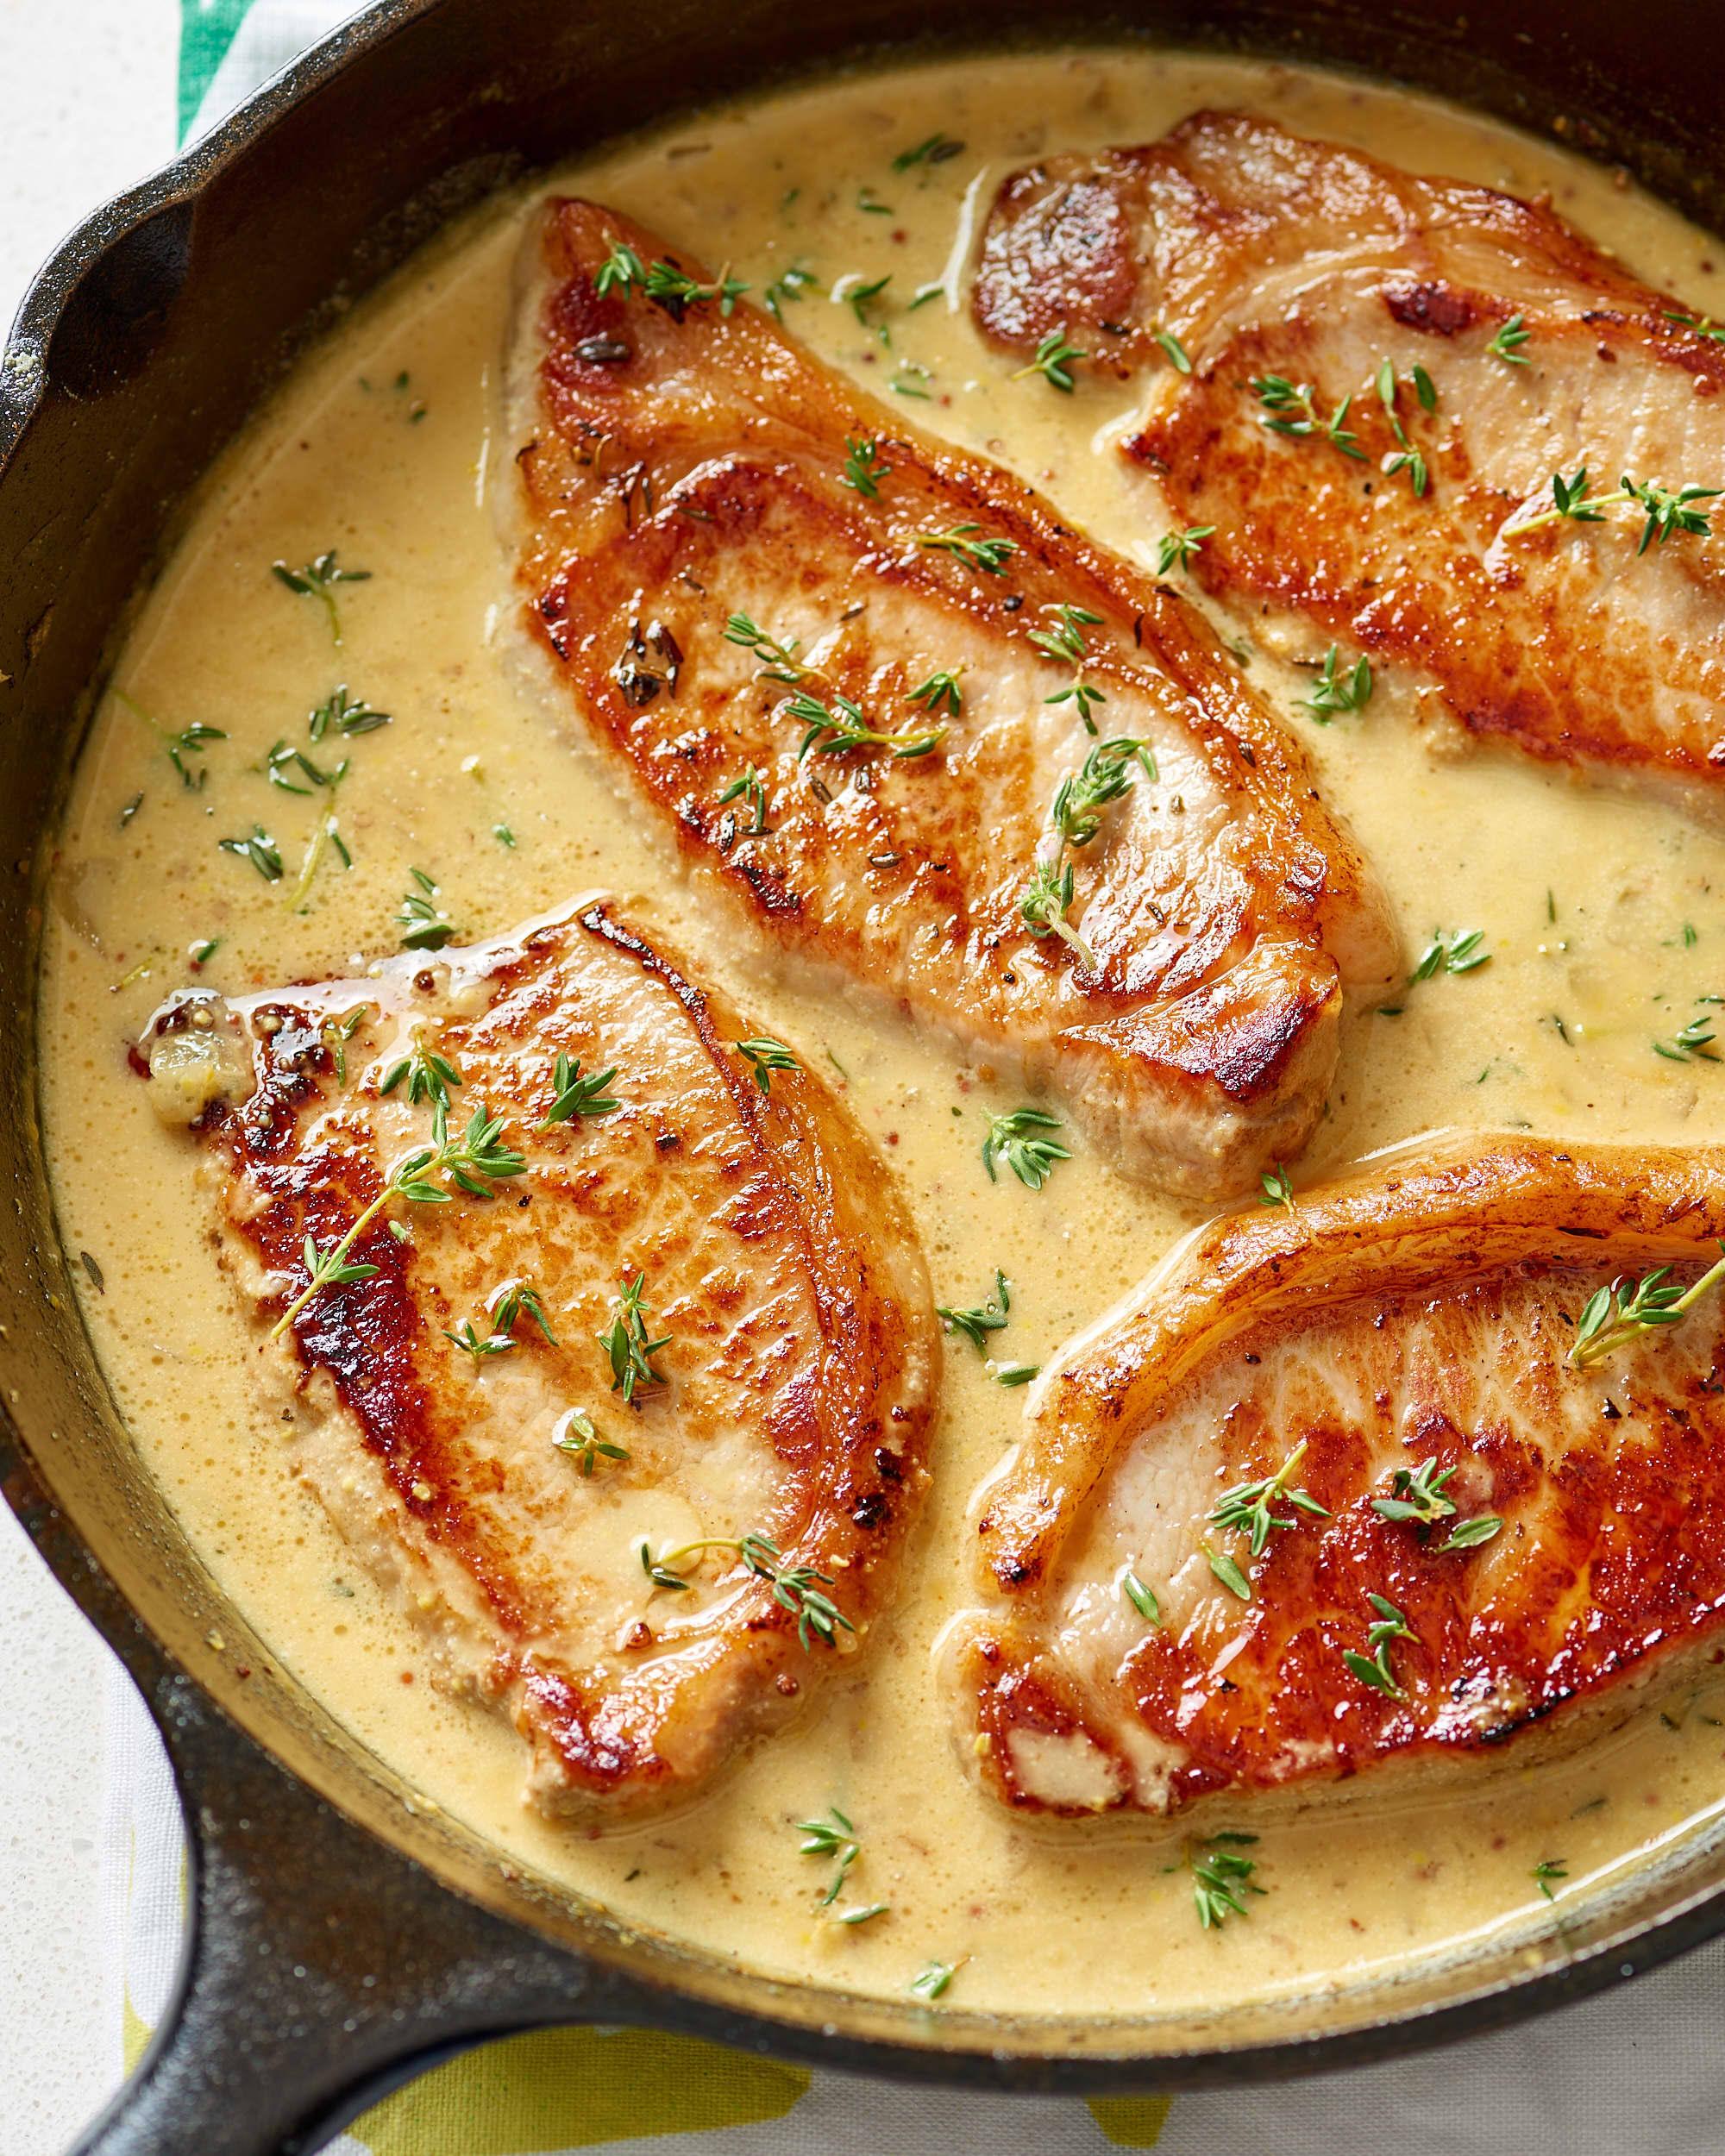 pork chop recipes whole grain mustard Easy Creamy Mustard Pork Chops